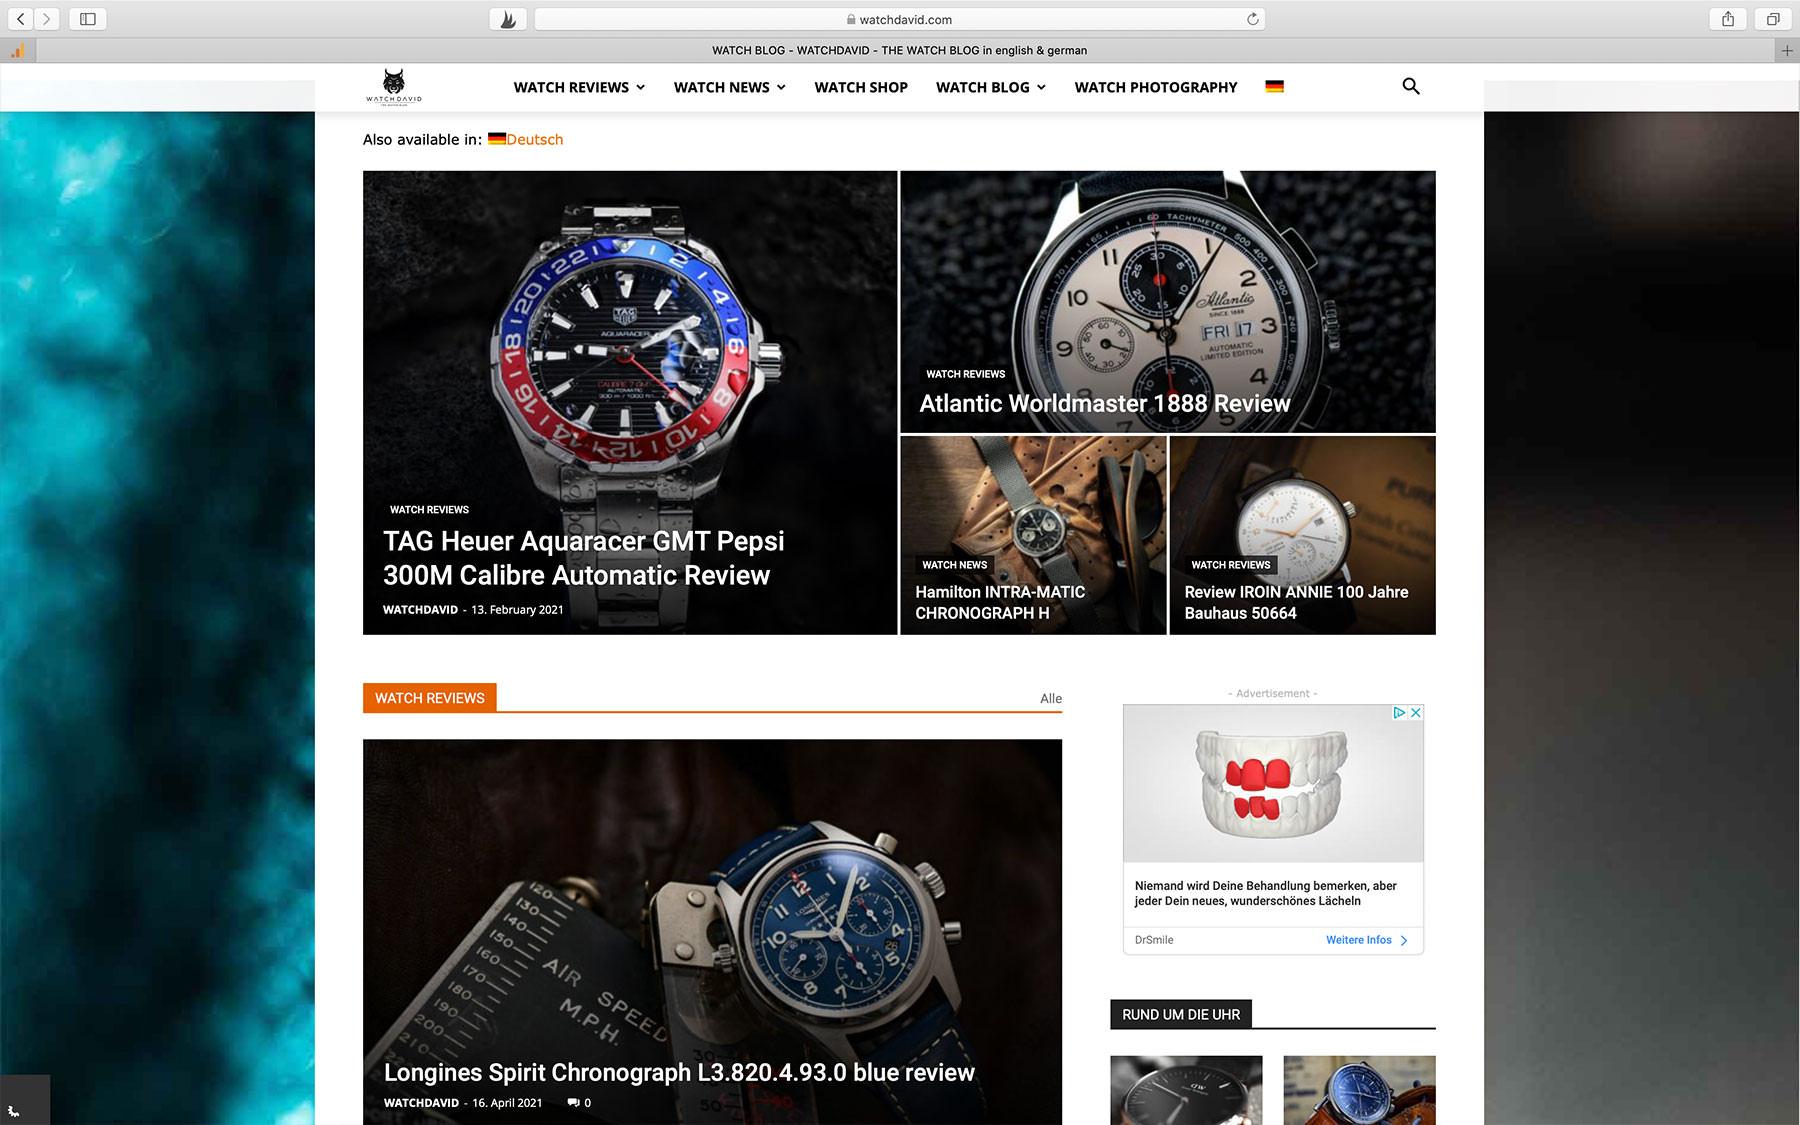 Watch Blogs WATCHDAVID